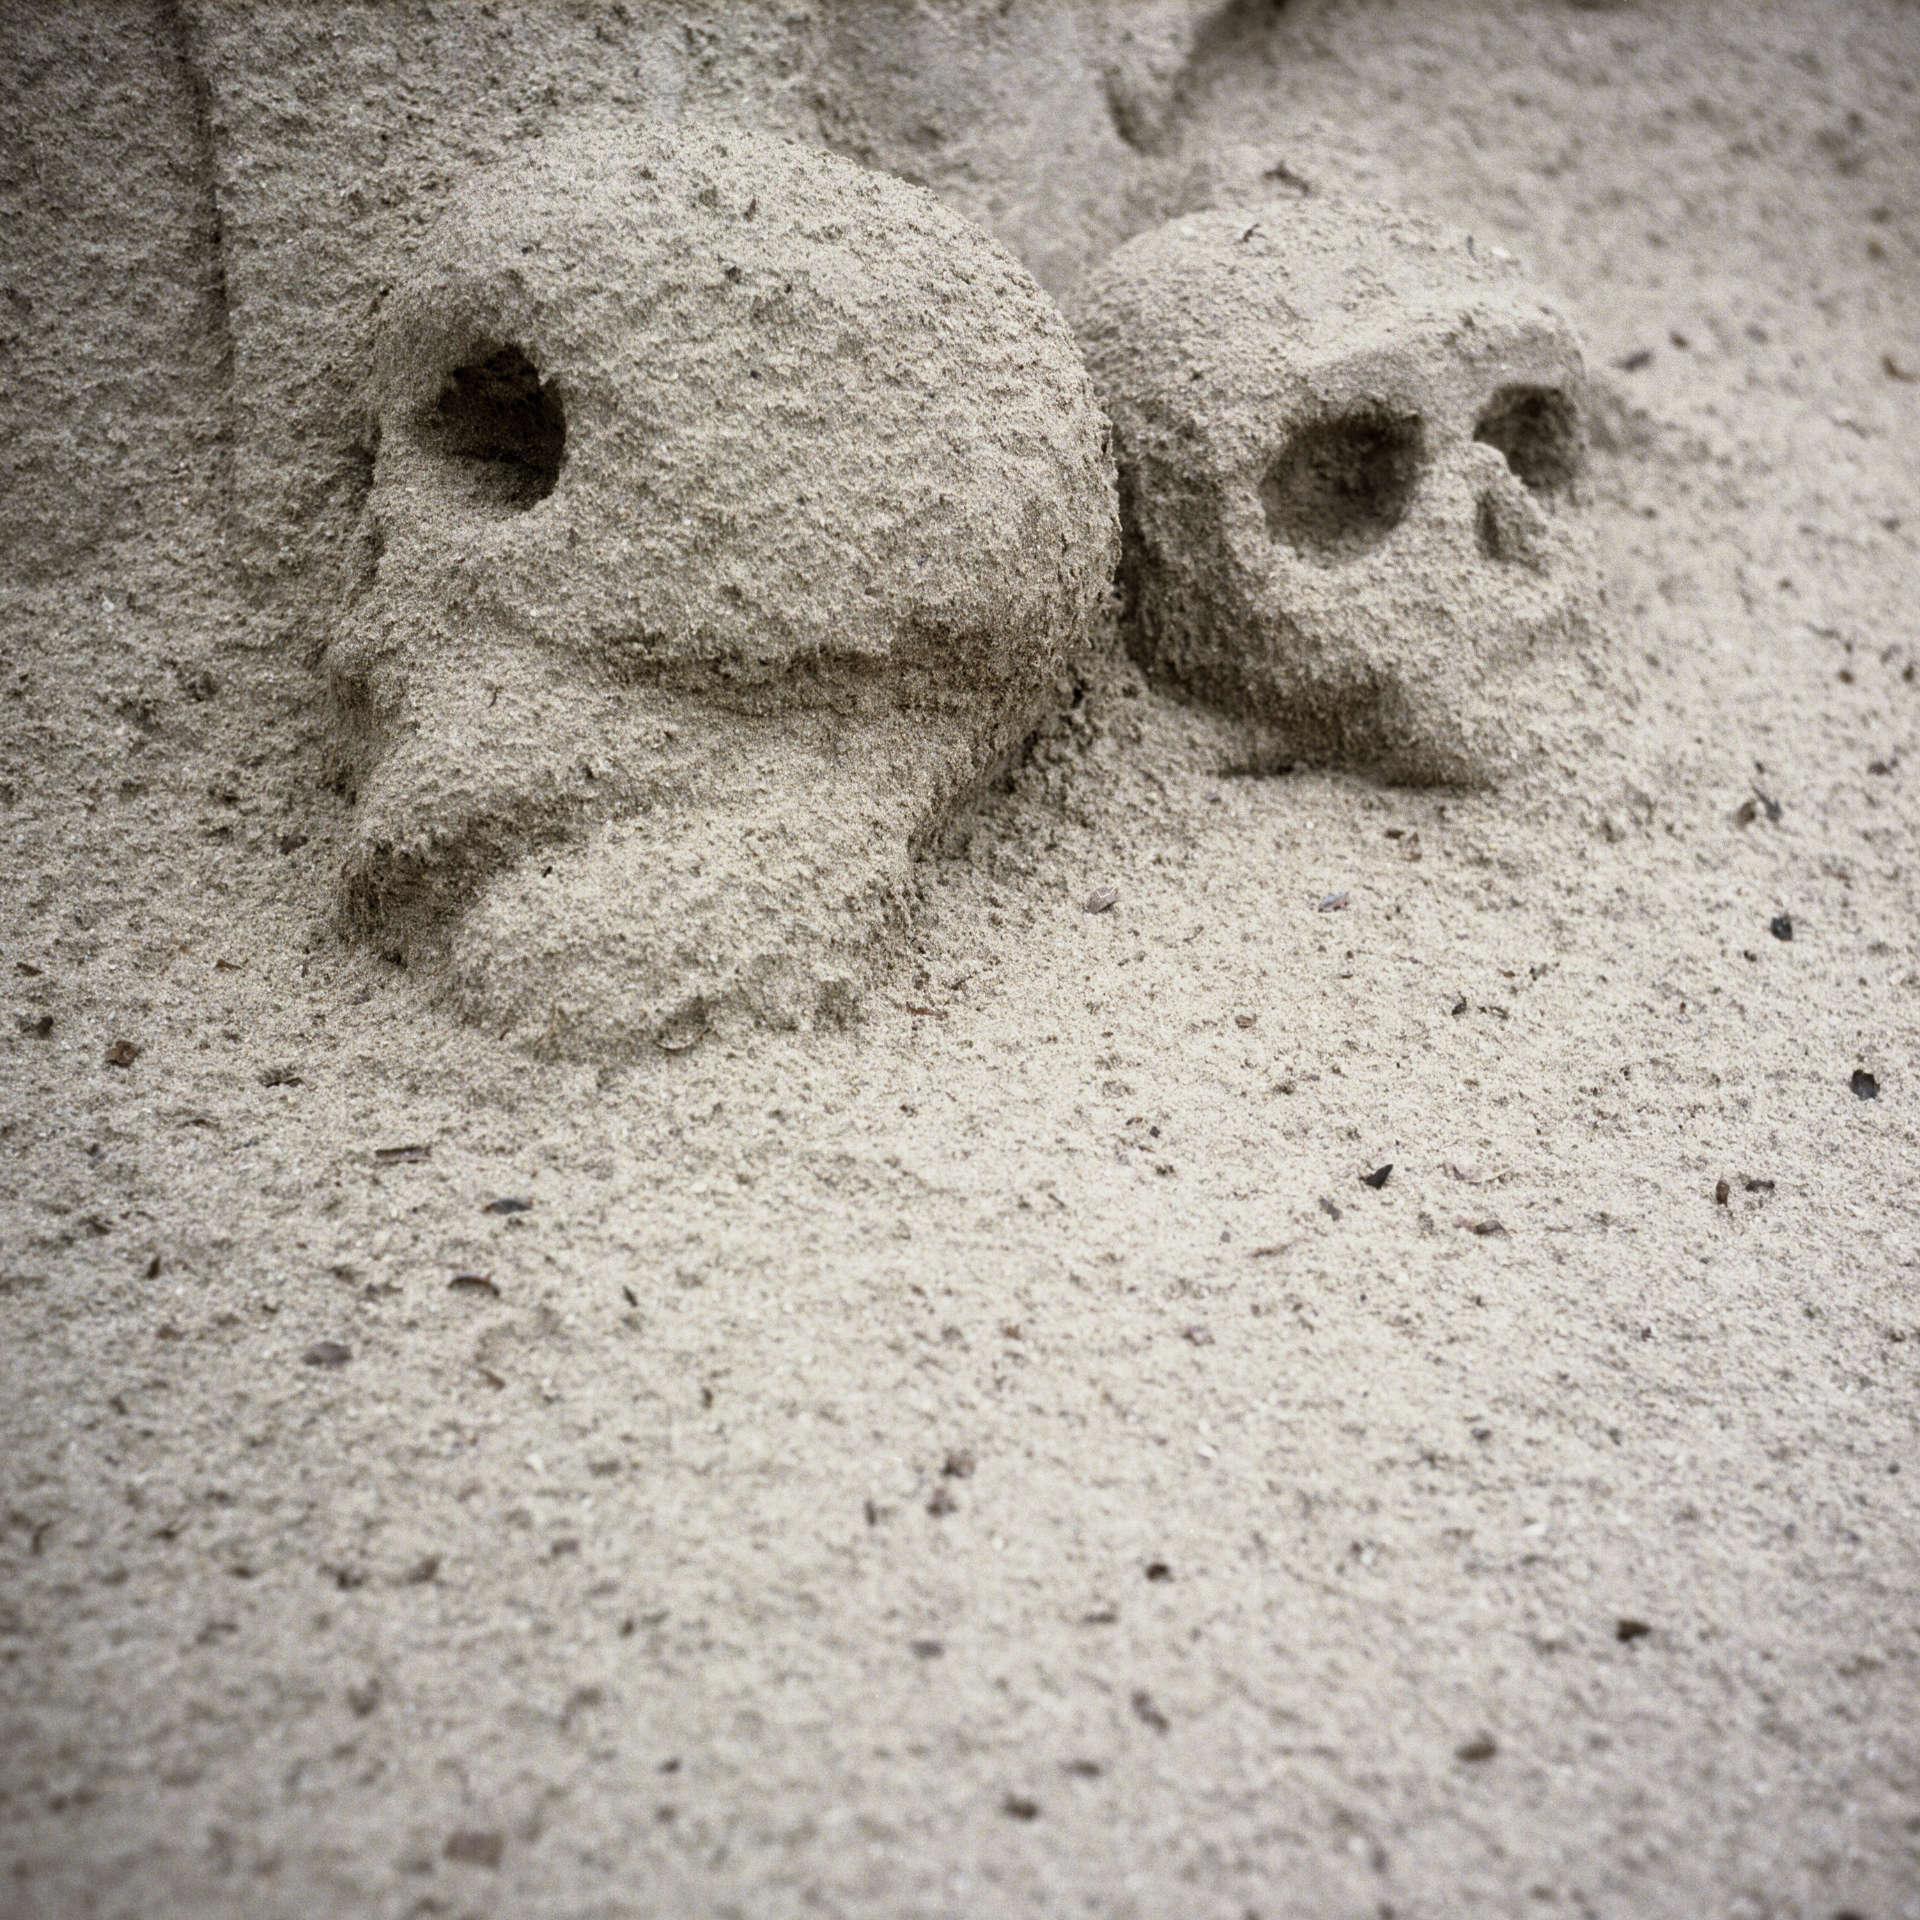 barcelona-acid-rain-photography-emil-kozak